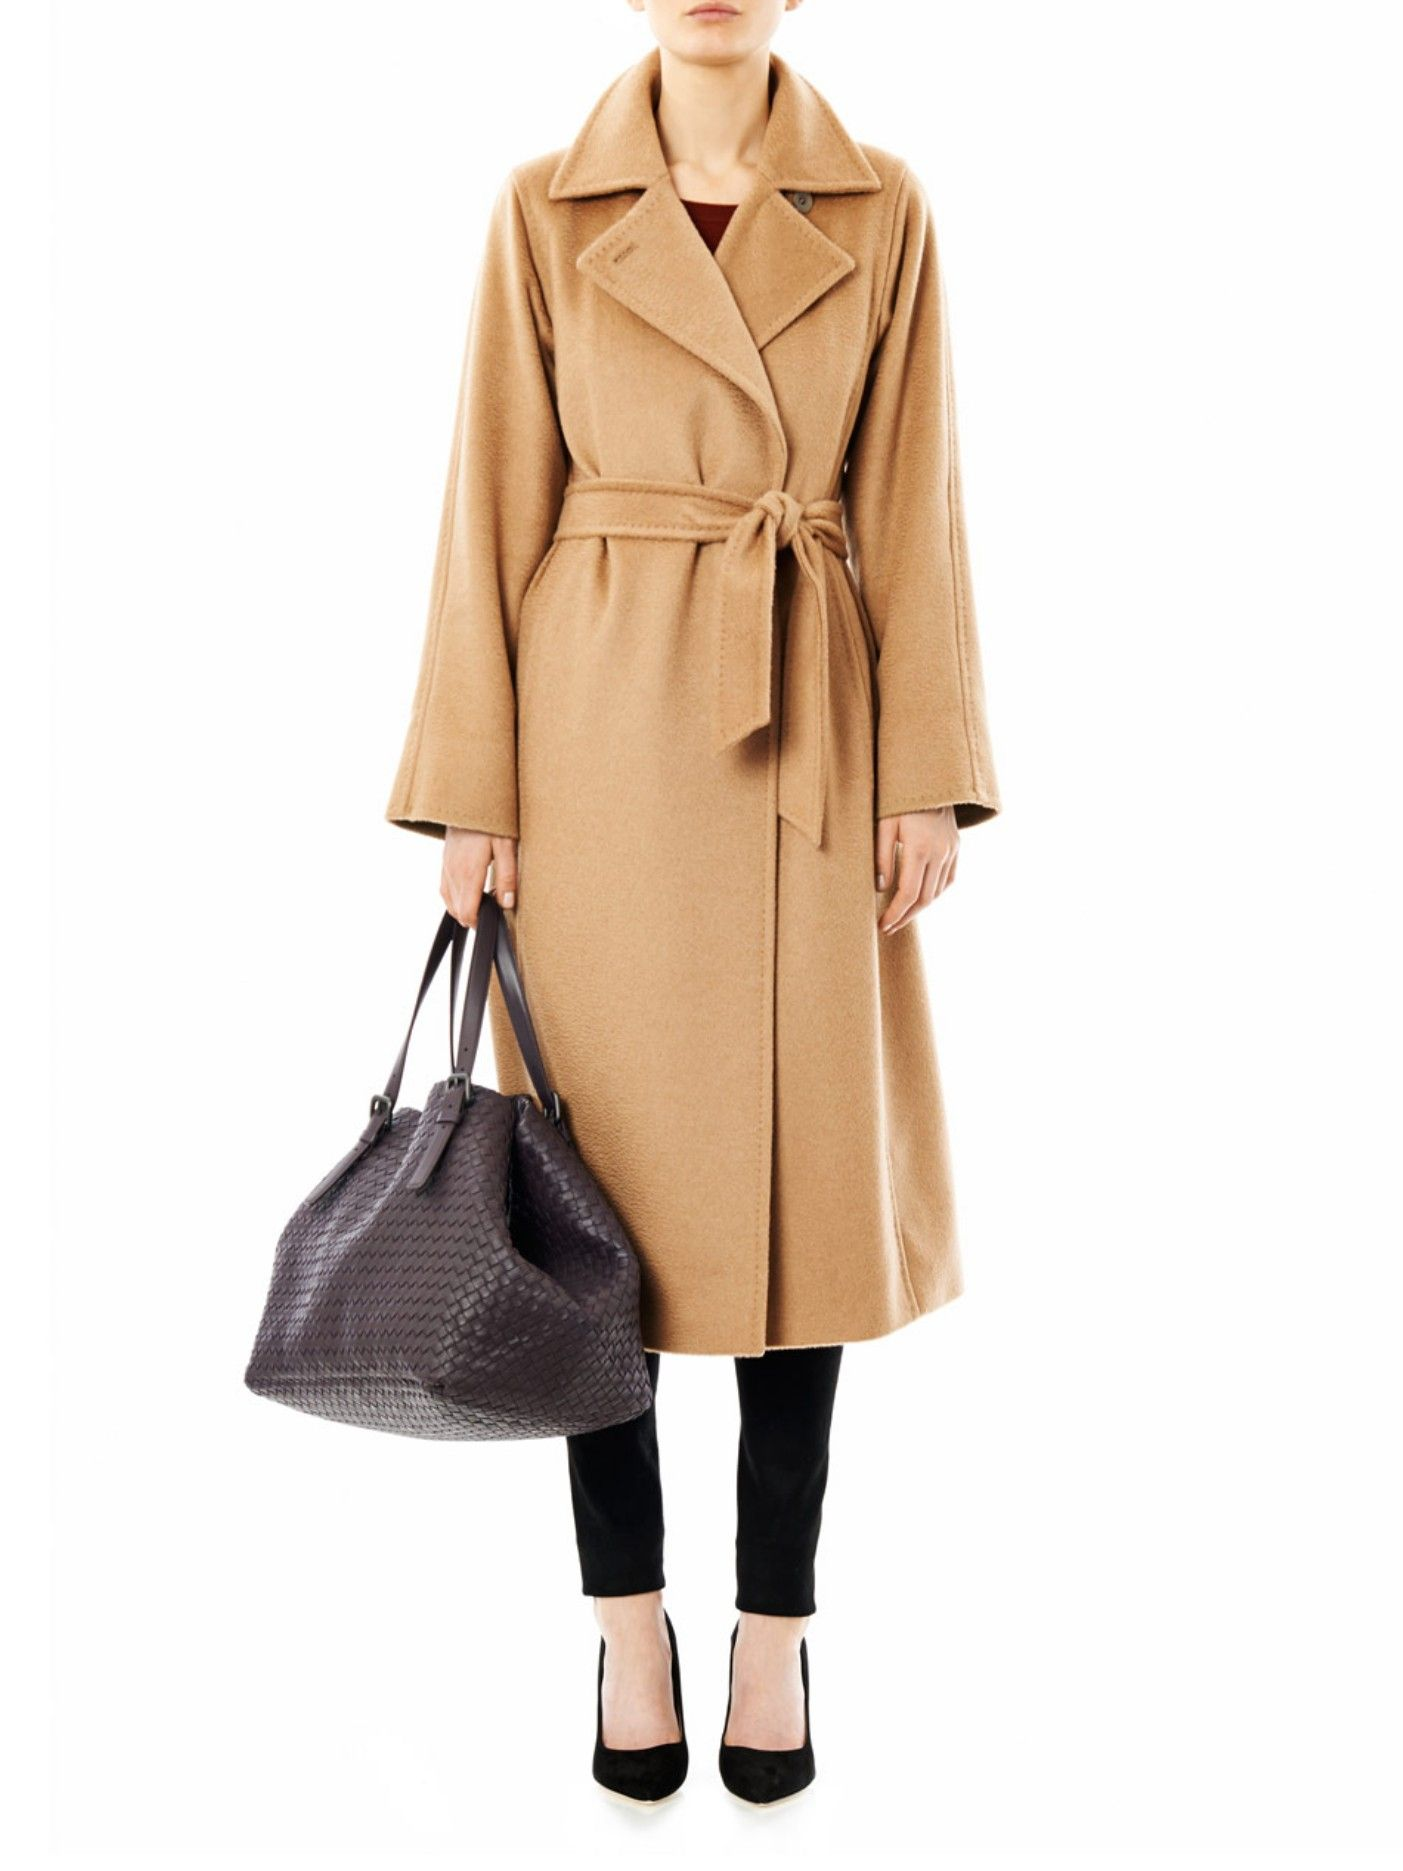 520fda3eb6 Manuela coat